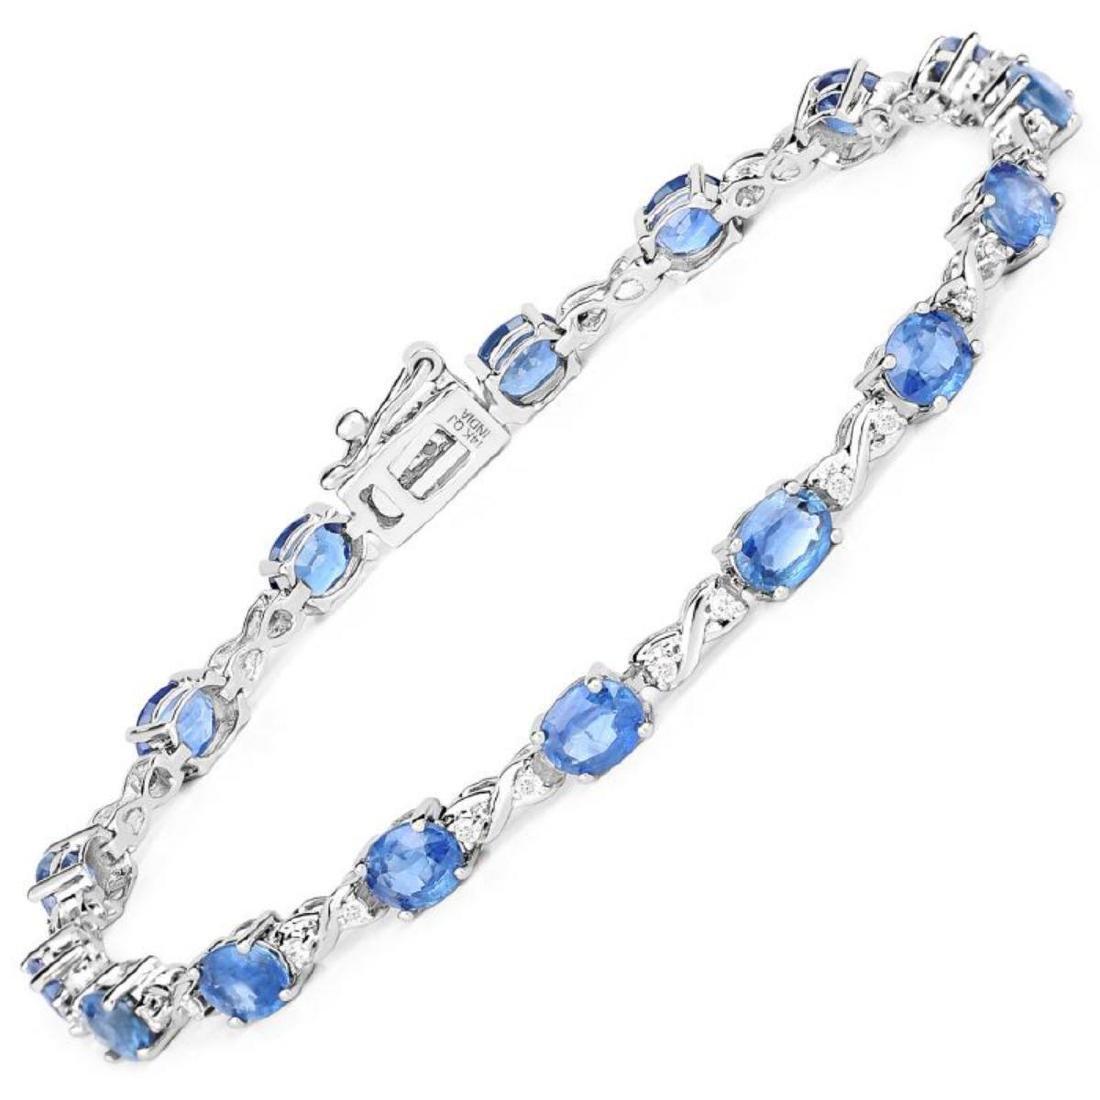 7.81 Carat Genuine Blue Sapphire and White Diamond 14K